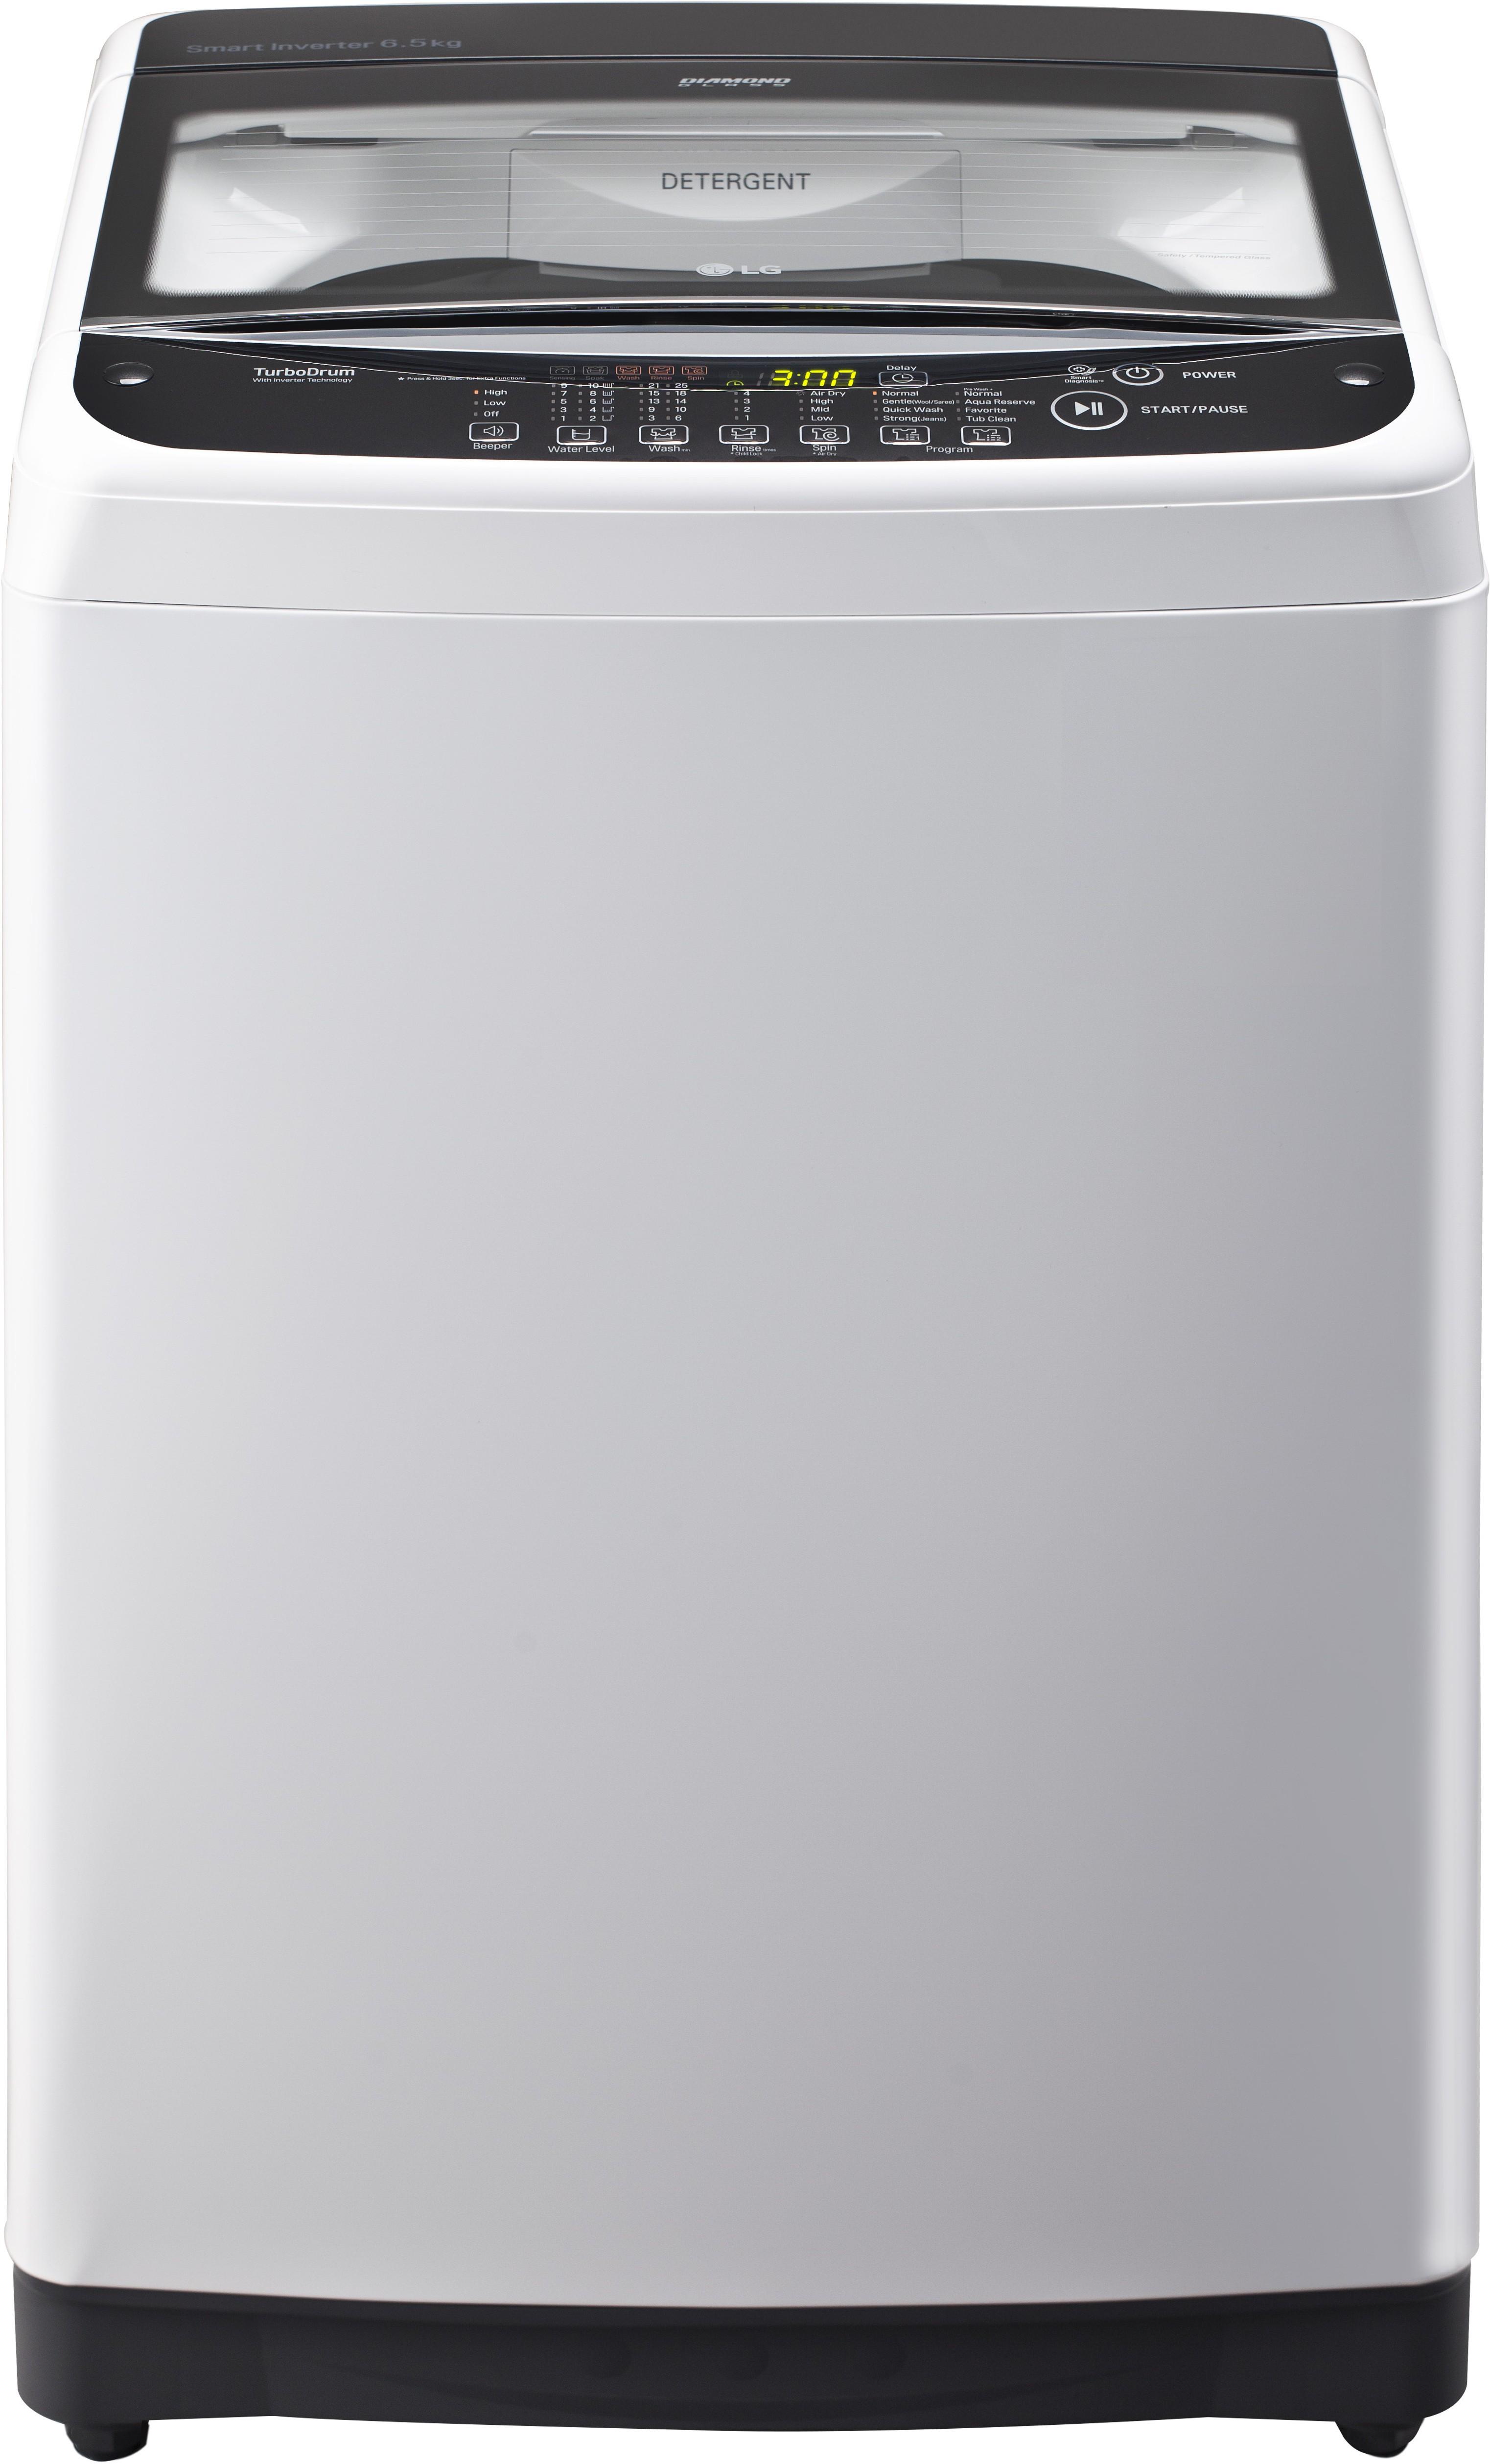 LG 6.5 kg Fully Automatic Top Load Washing Machine(T7581NEDLZ) Image